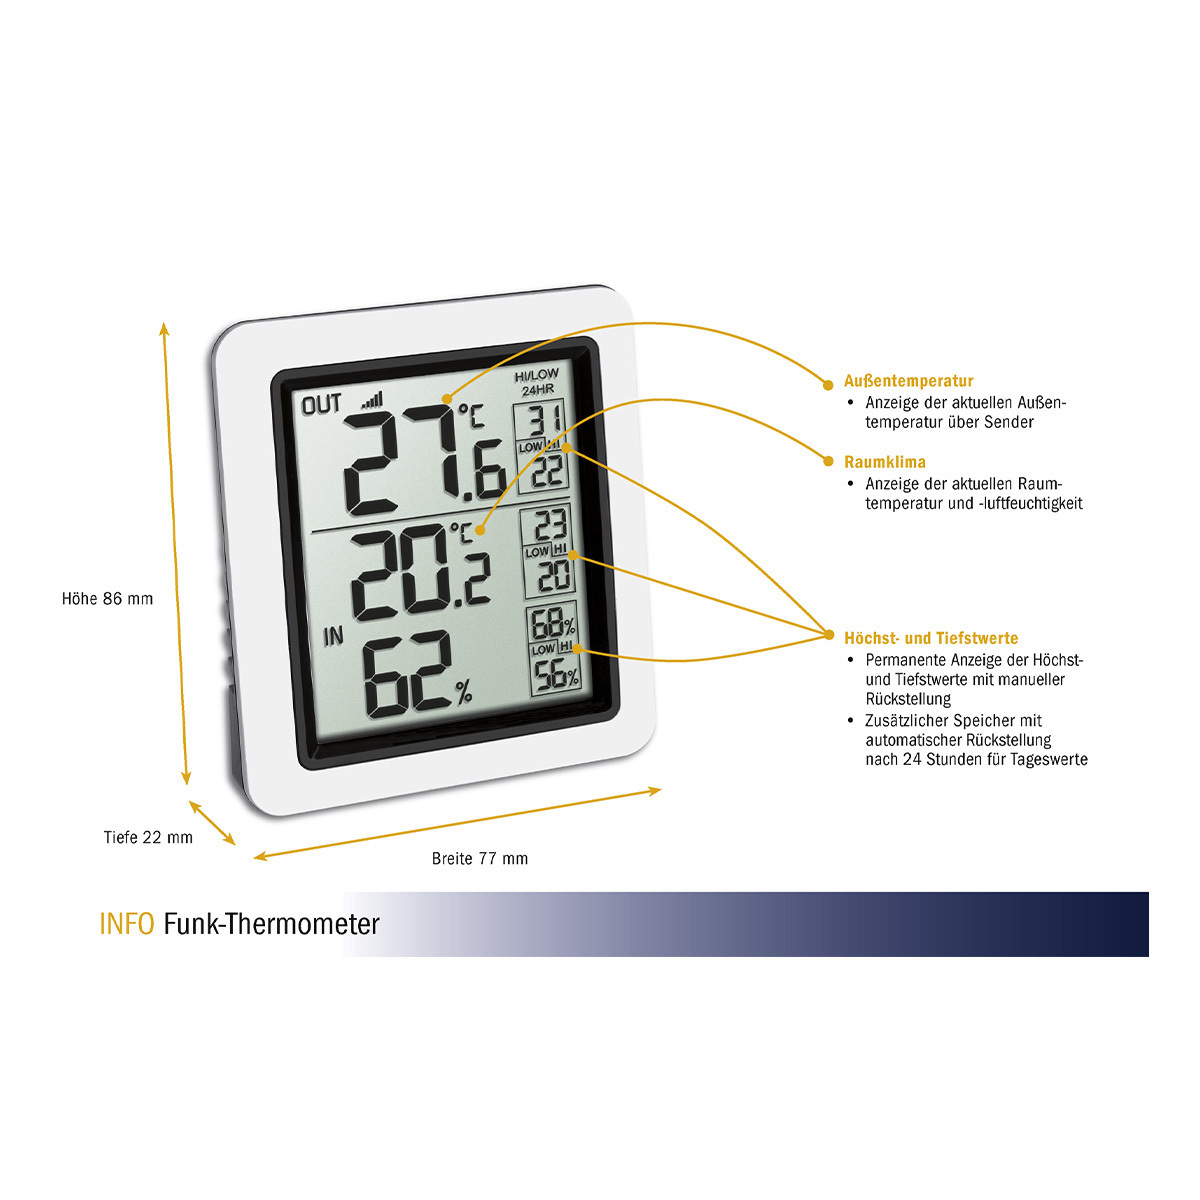 30-3065-02-funk-thermometer-info-abmessungen-1200x1200px.jpg